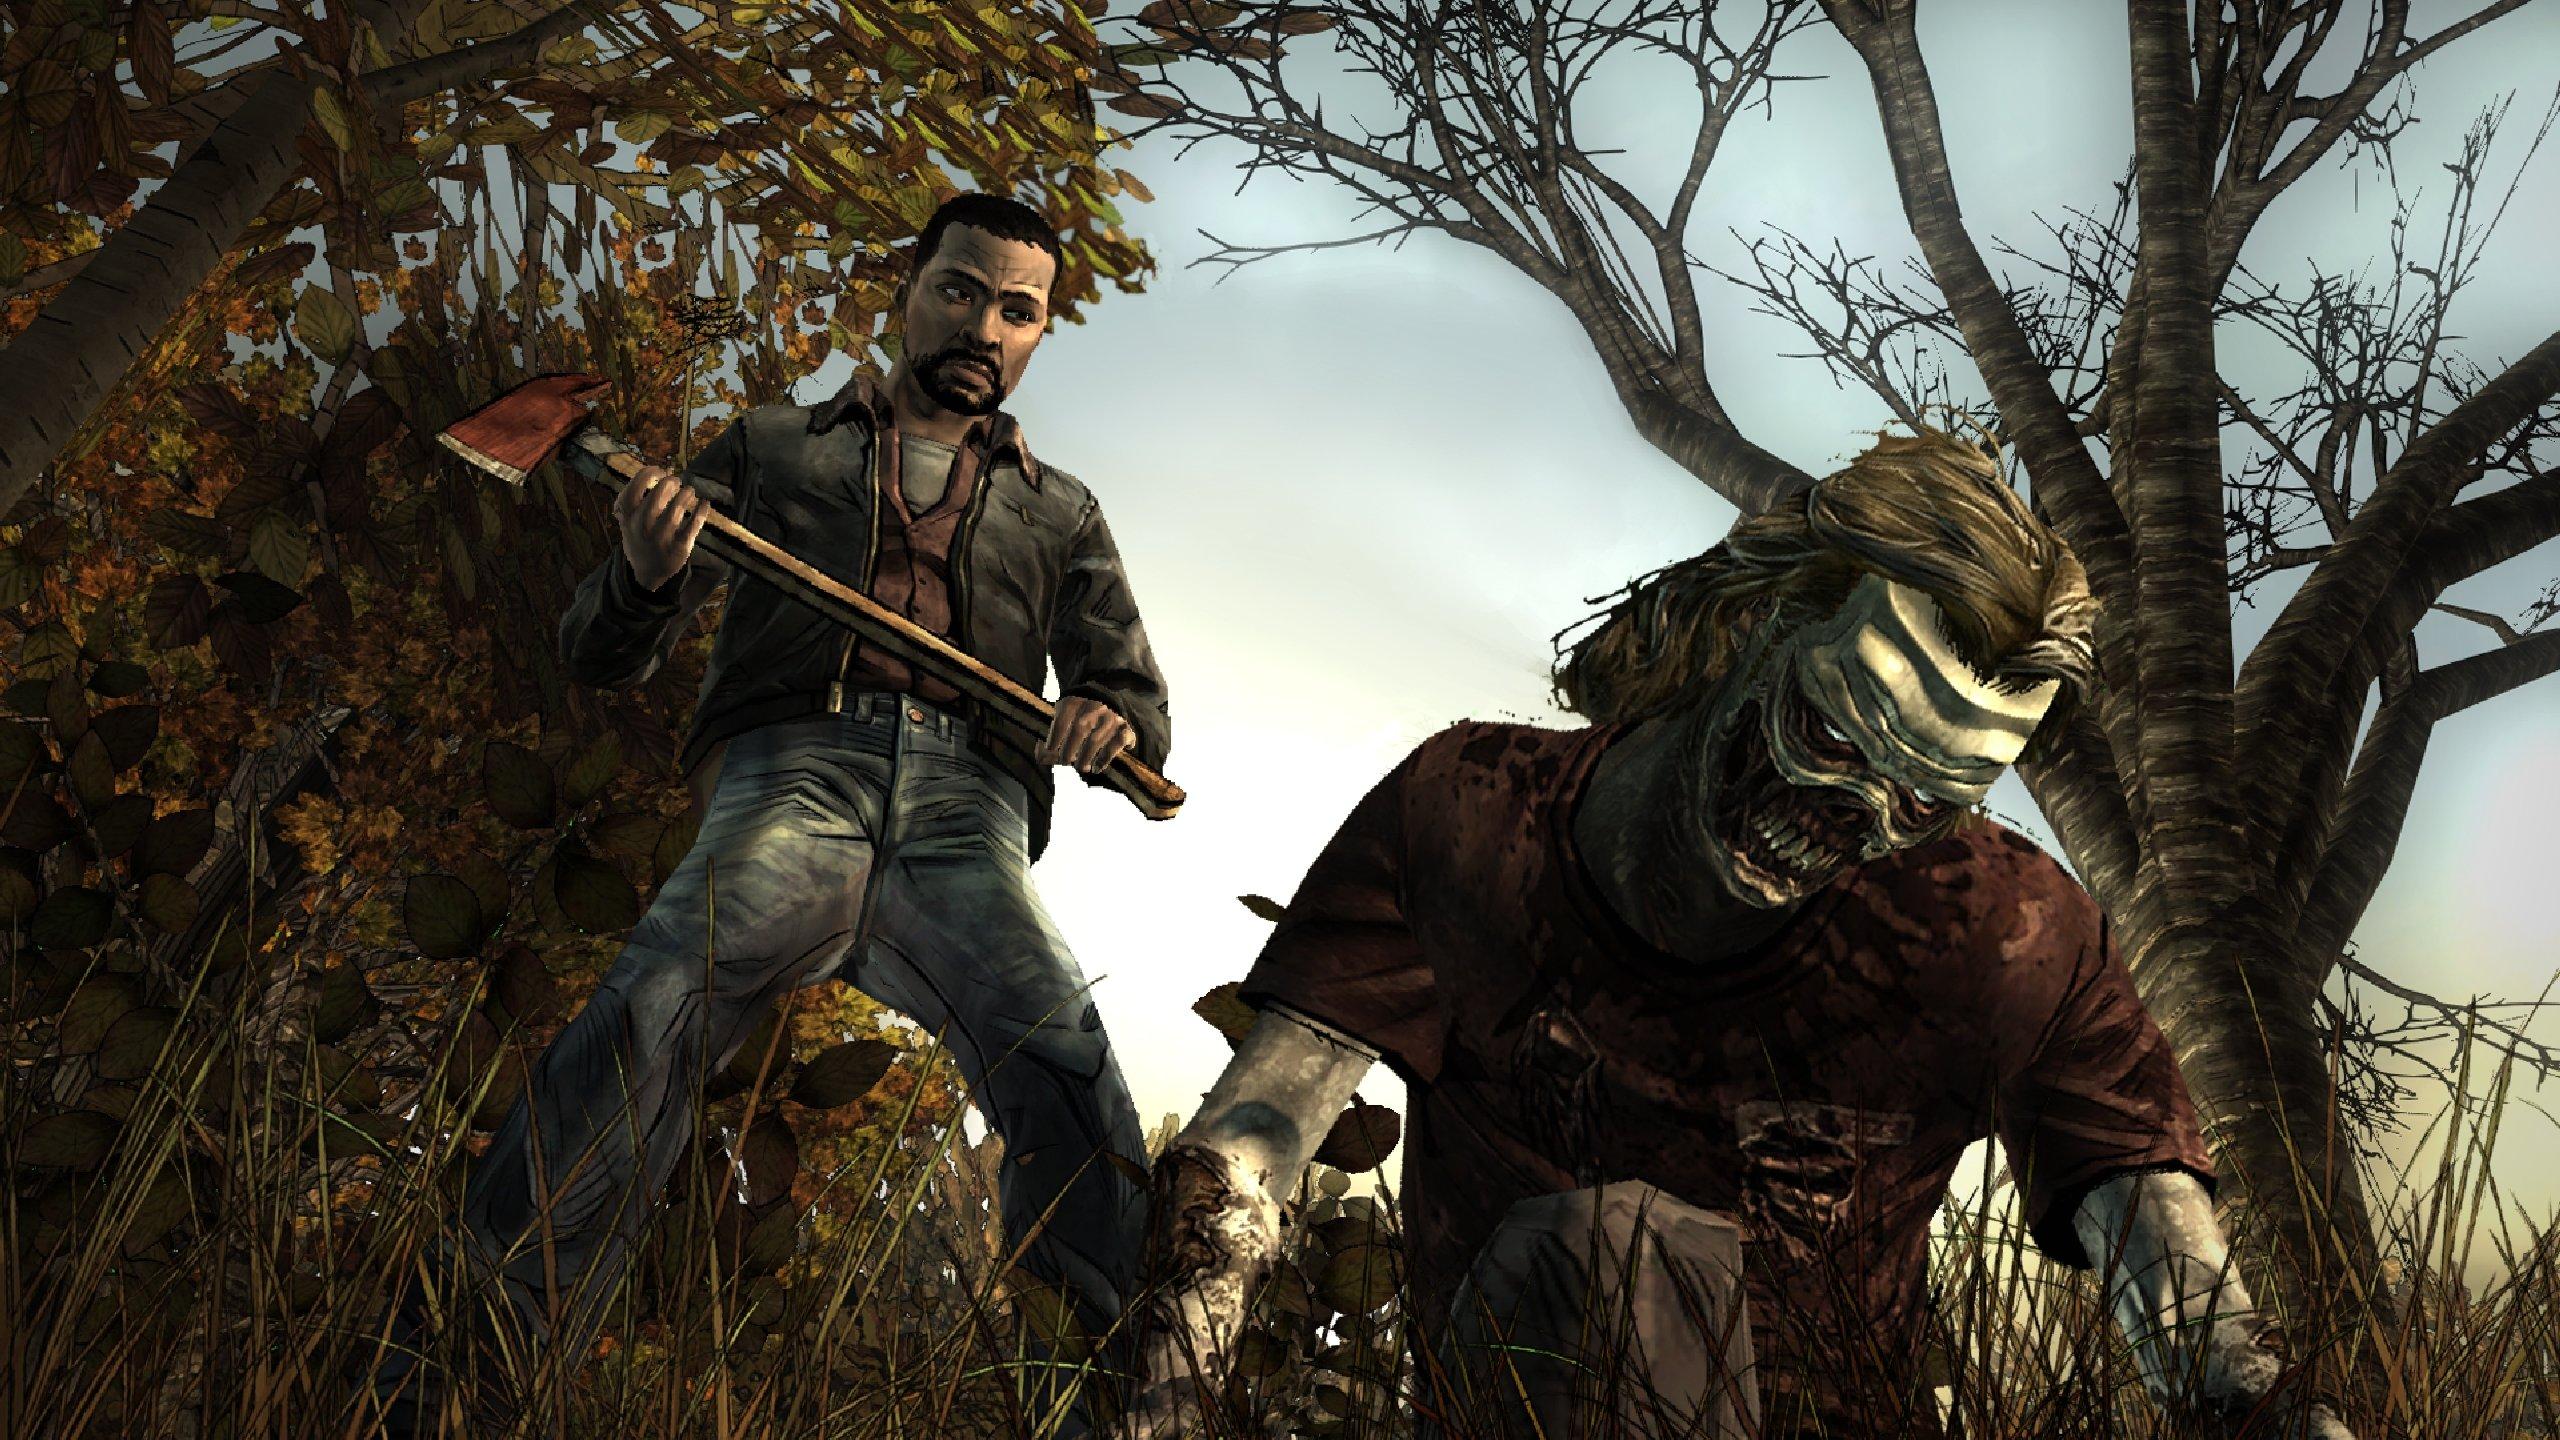 The Walking Dead Video Game Wallpapers 2560x1440 Desktop Backgrounds